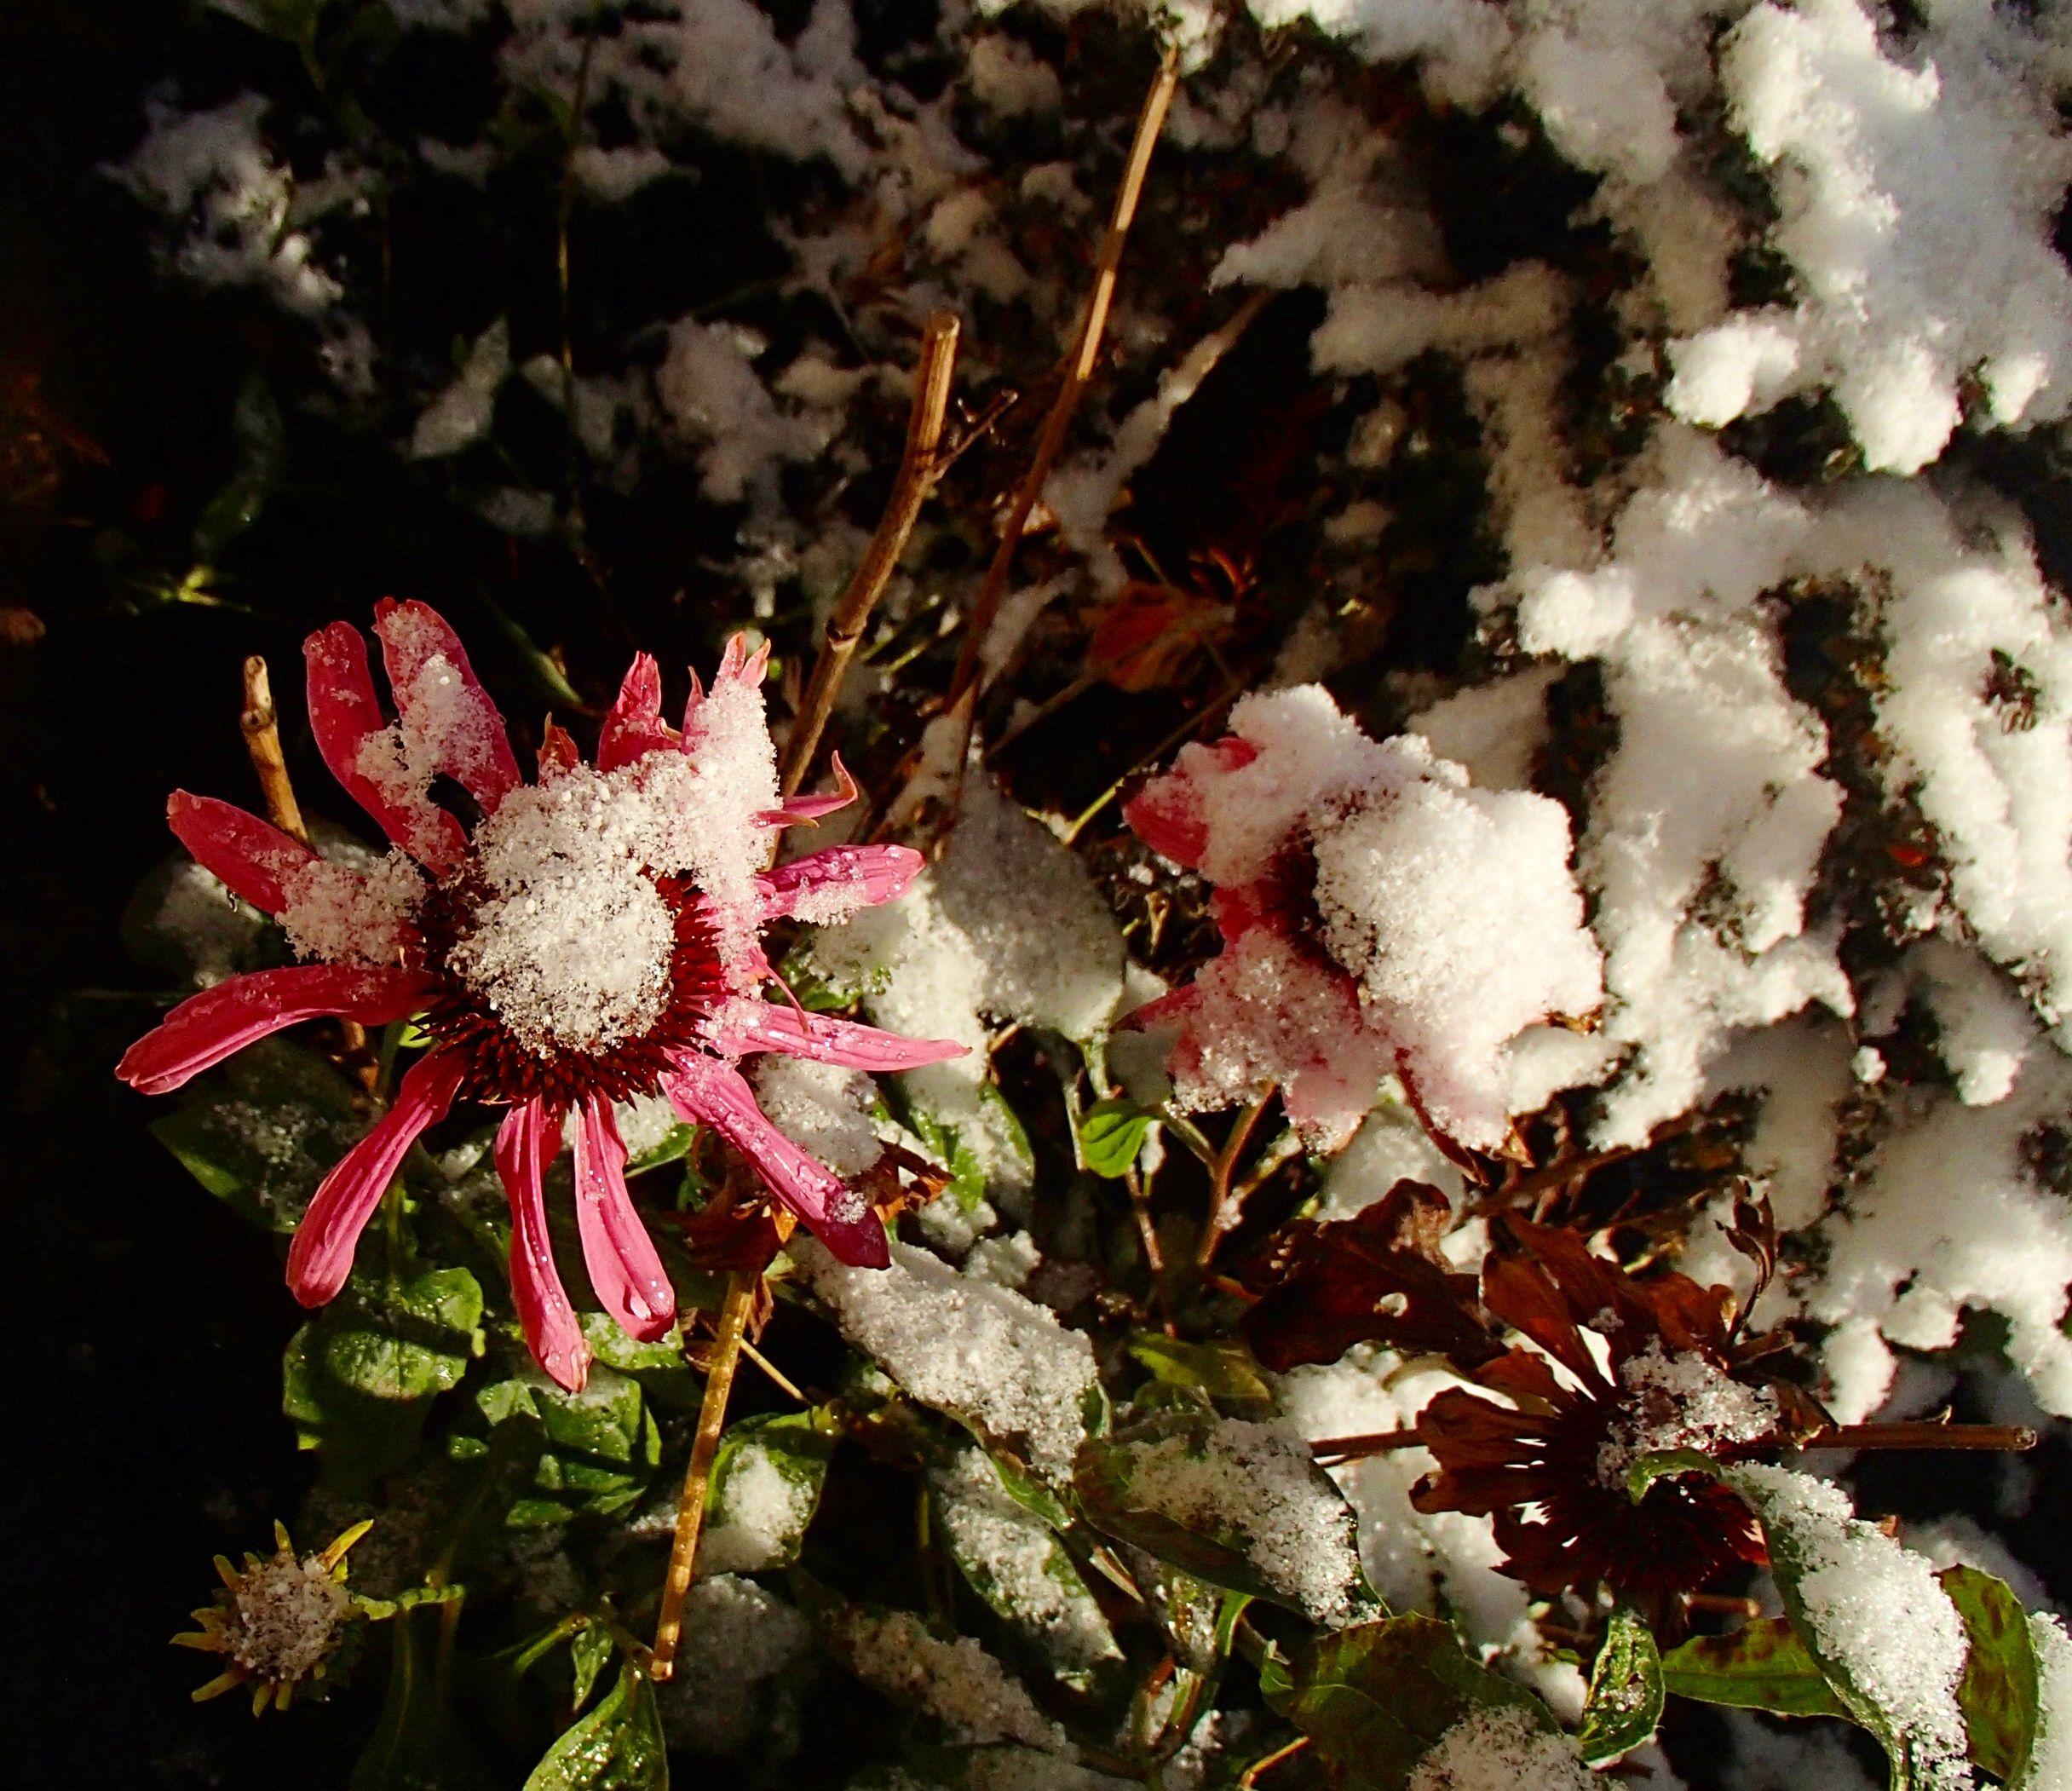 echinaceas under the snow